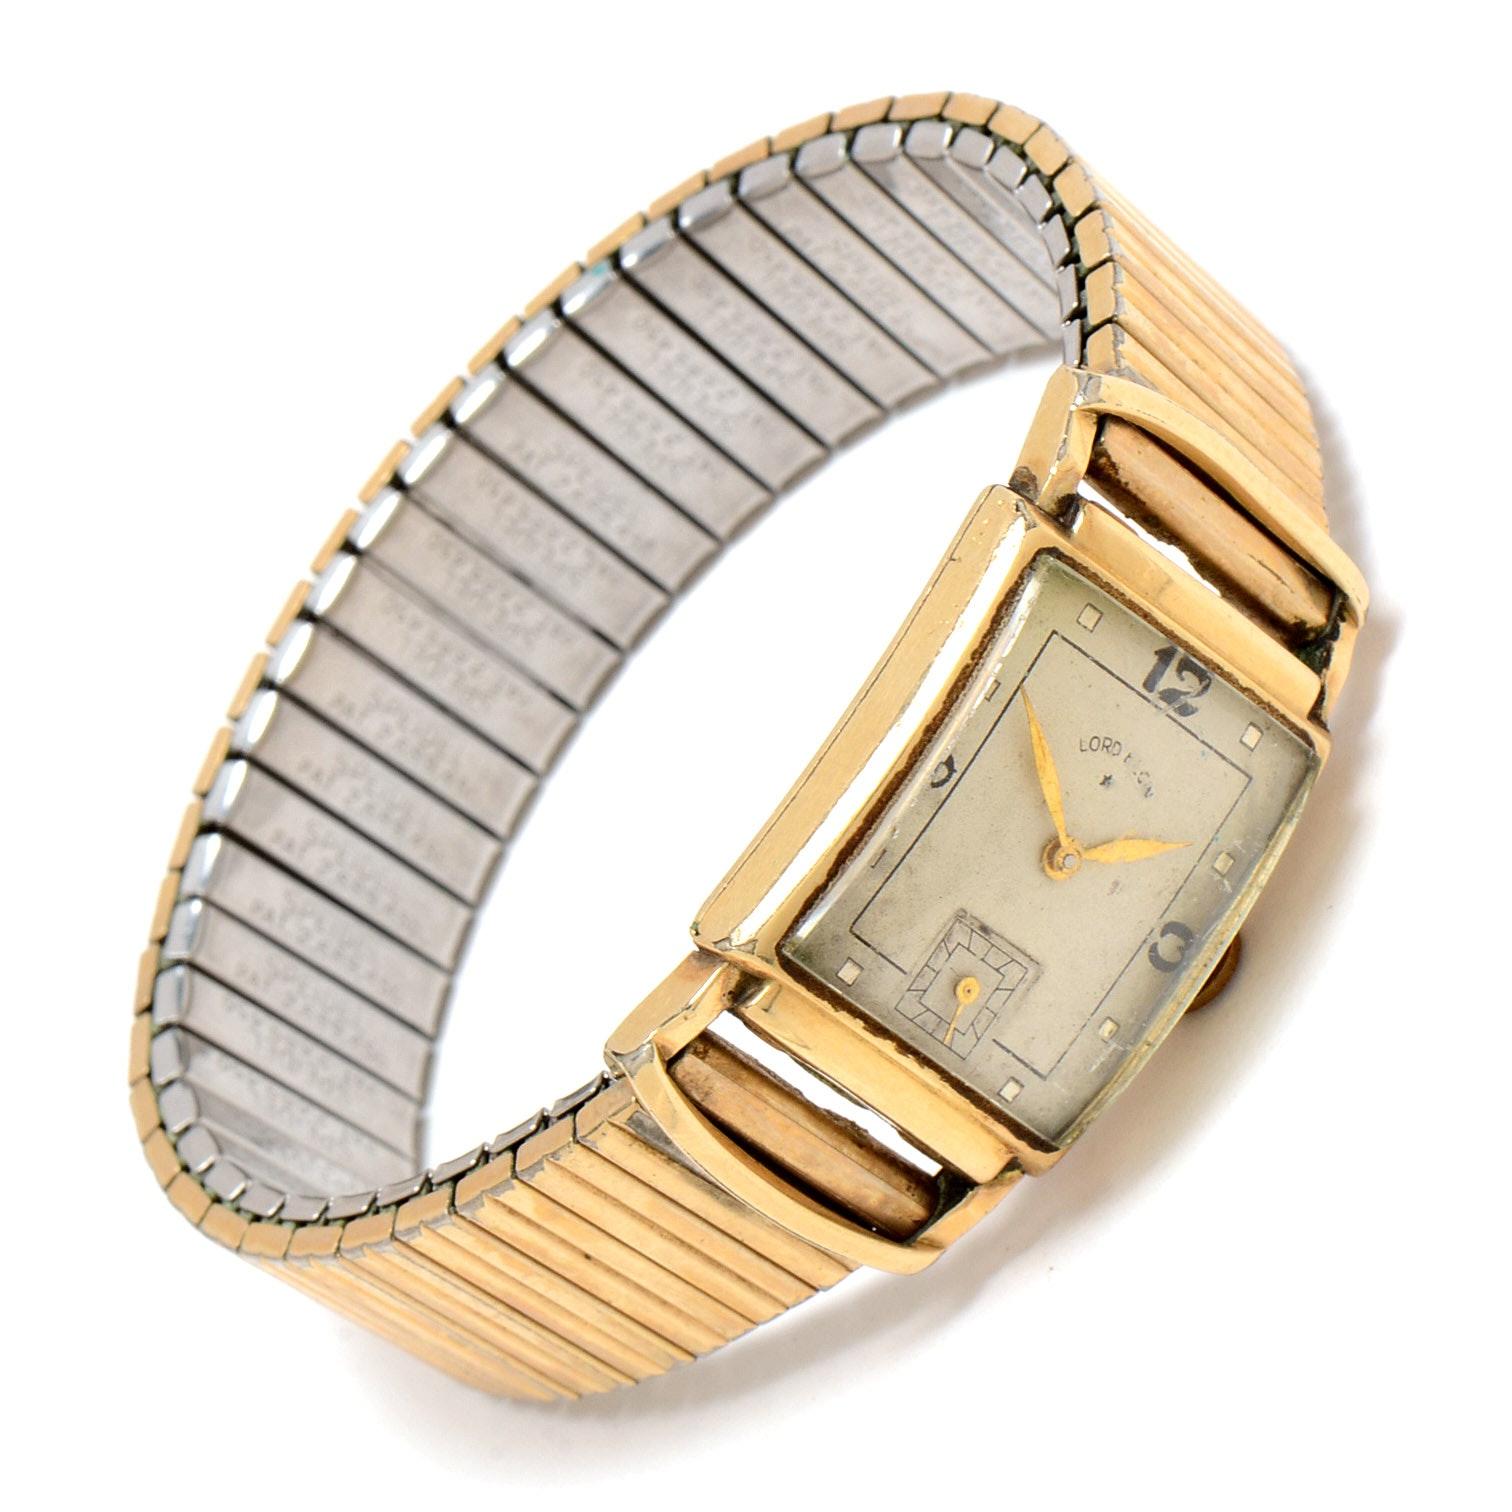 Vintage 14K Gold Filled Lord Elgin Wristwatch